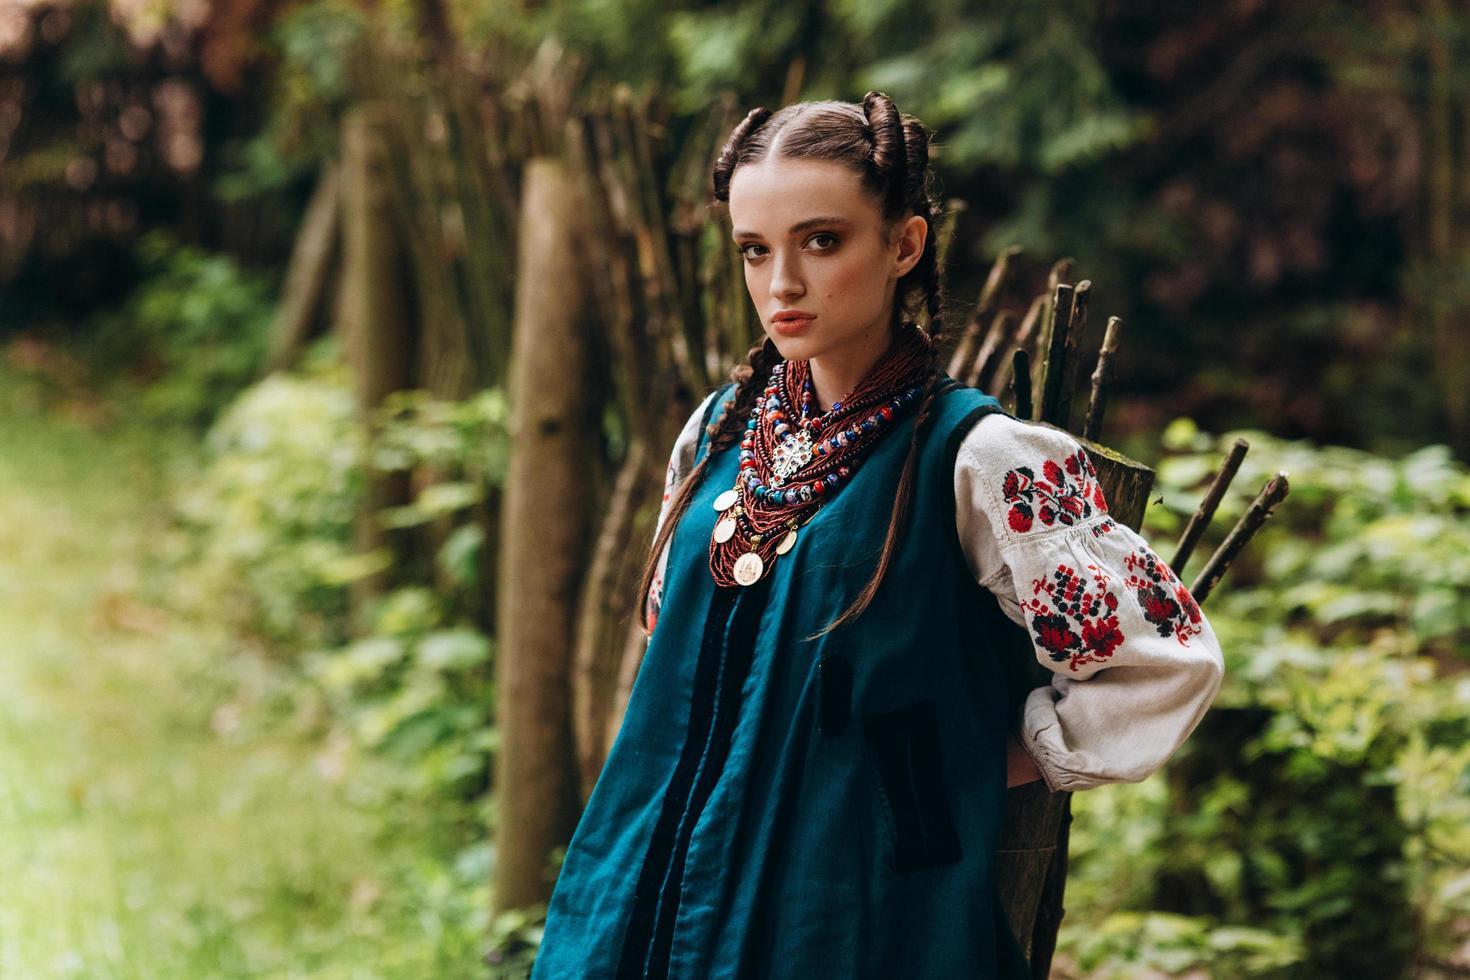 belle fille en costume traditionnel ukrainien photo